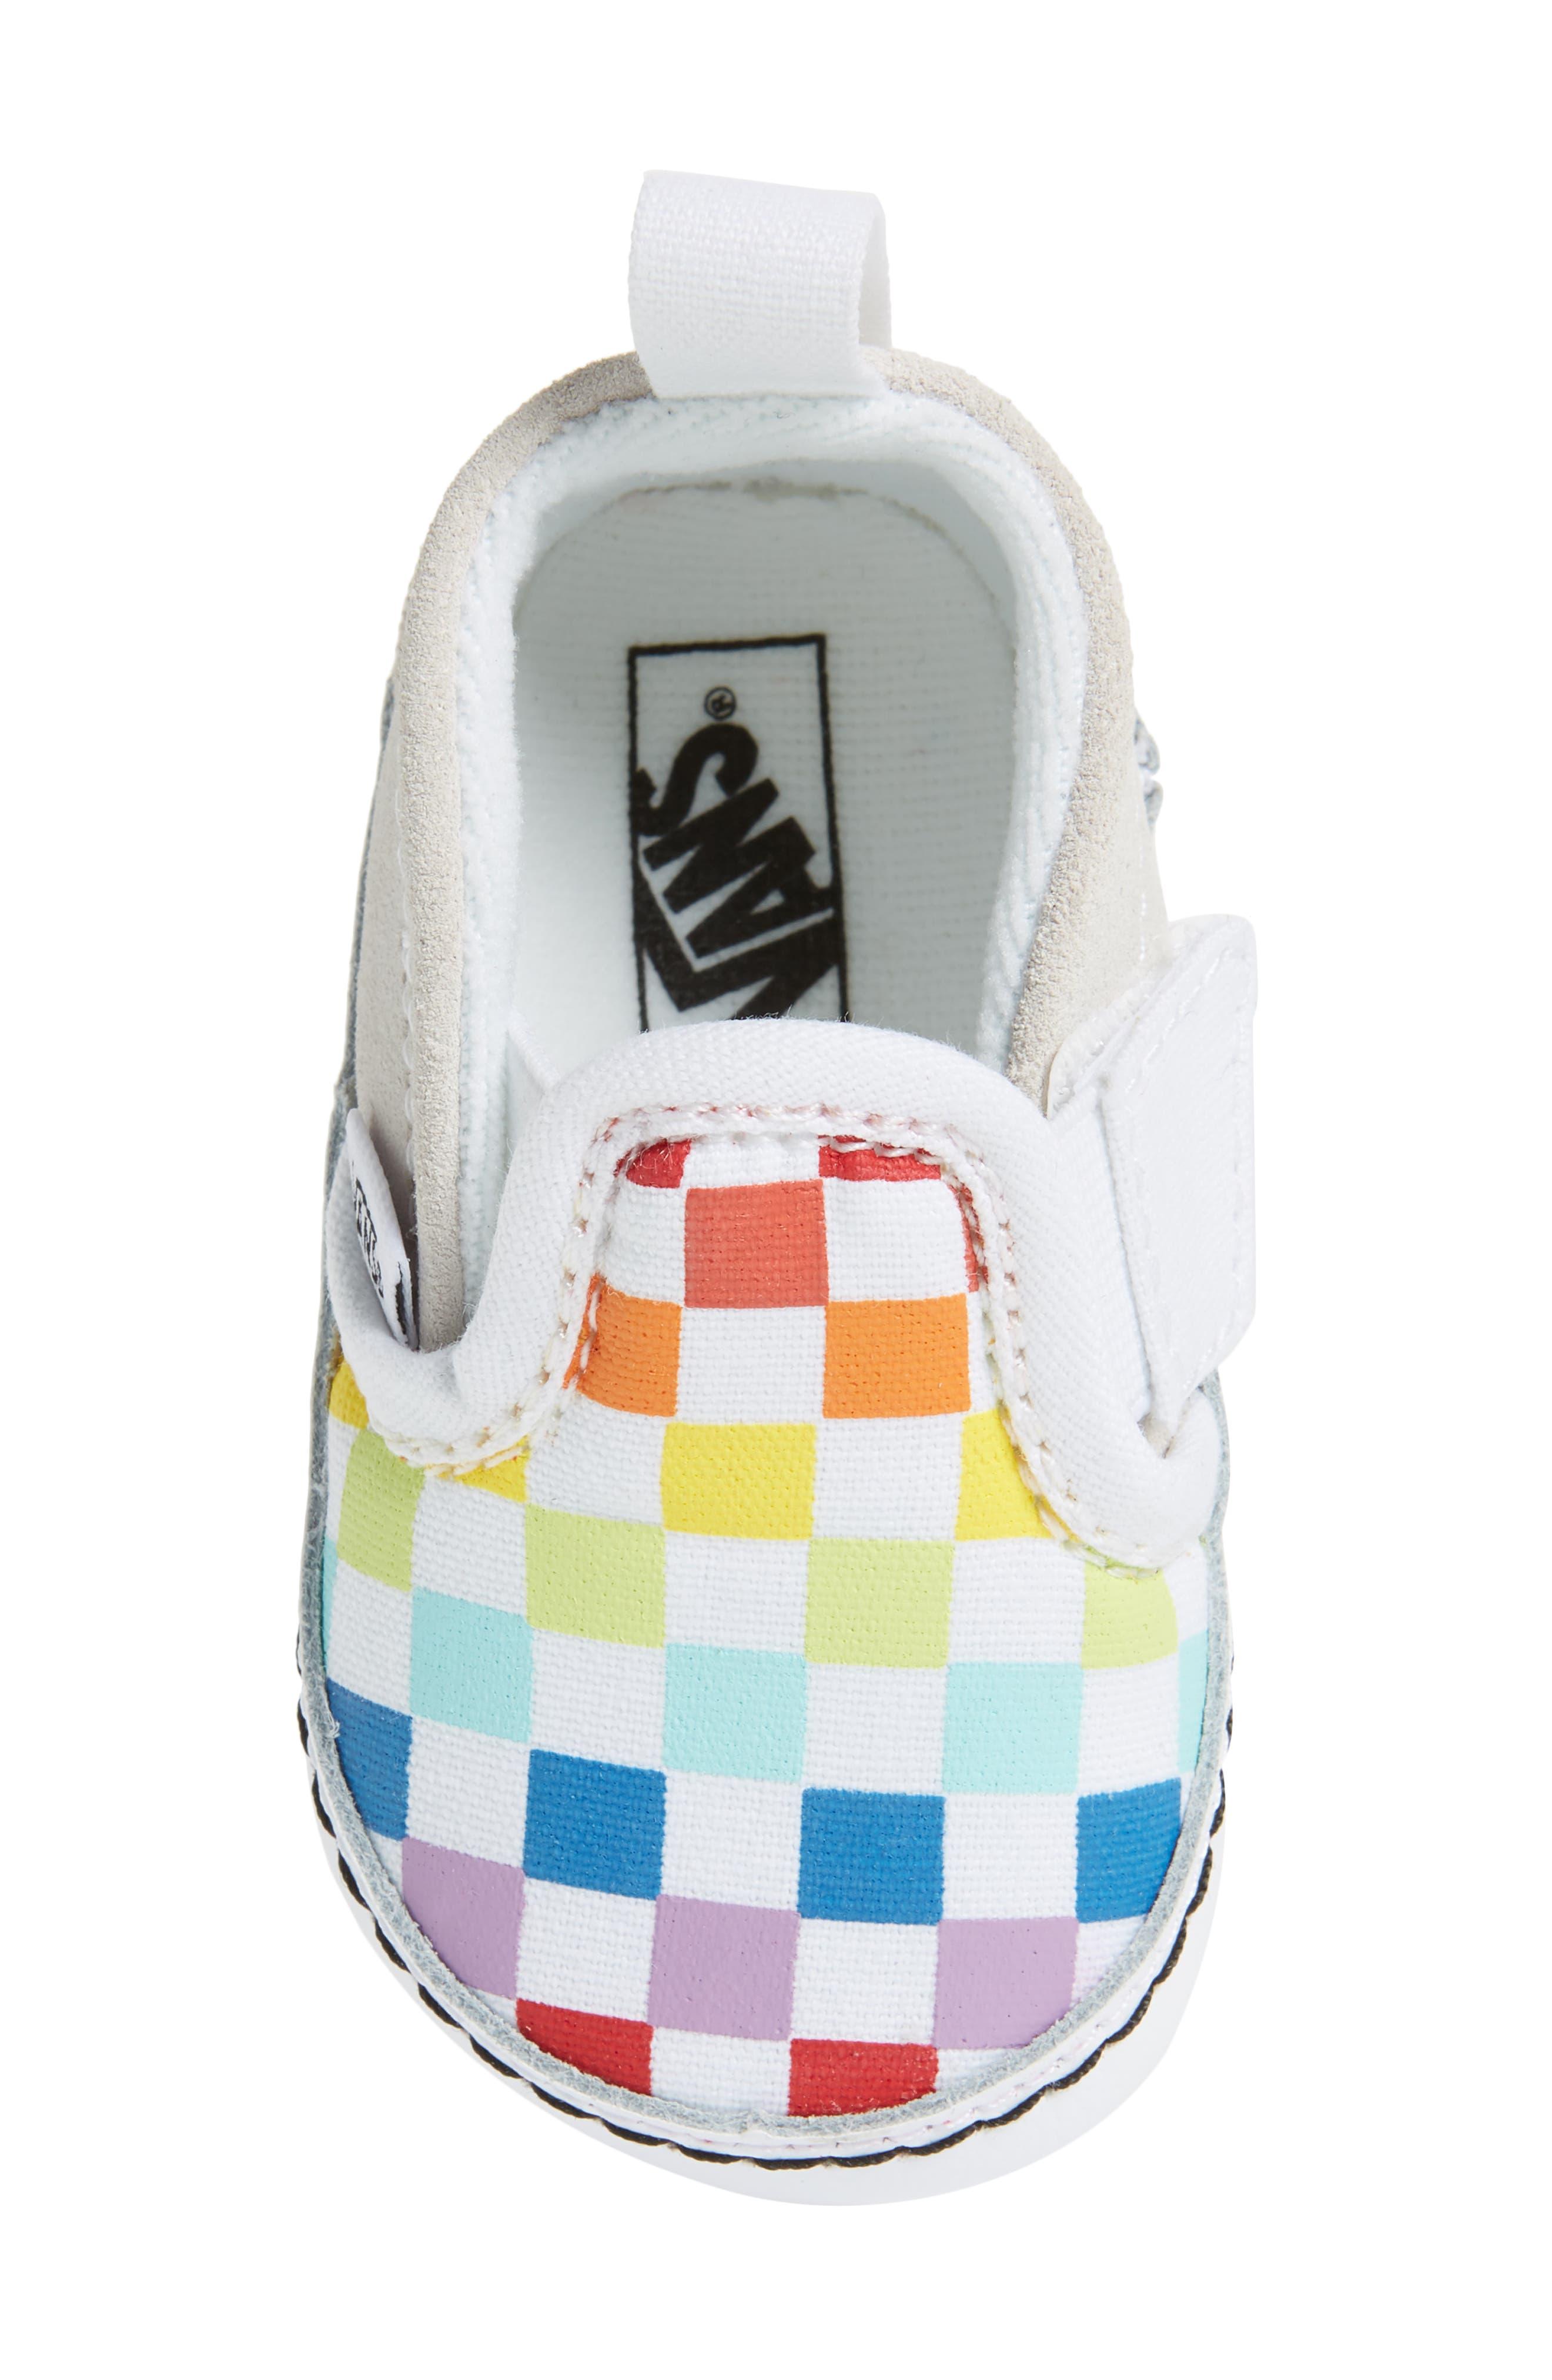 Slip-On Crib Shoe,                             Alternate thumbnail 3, color,                             Checkerboard Rainbow/ White